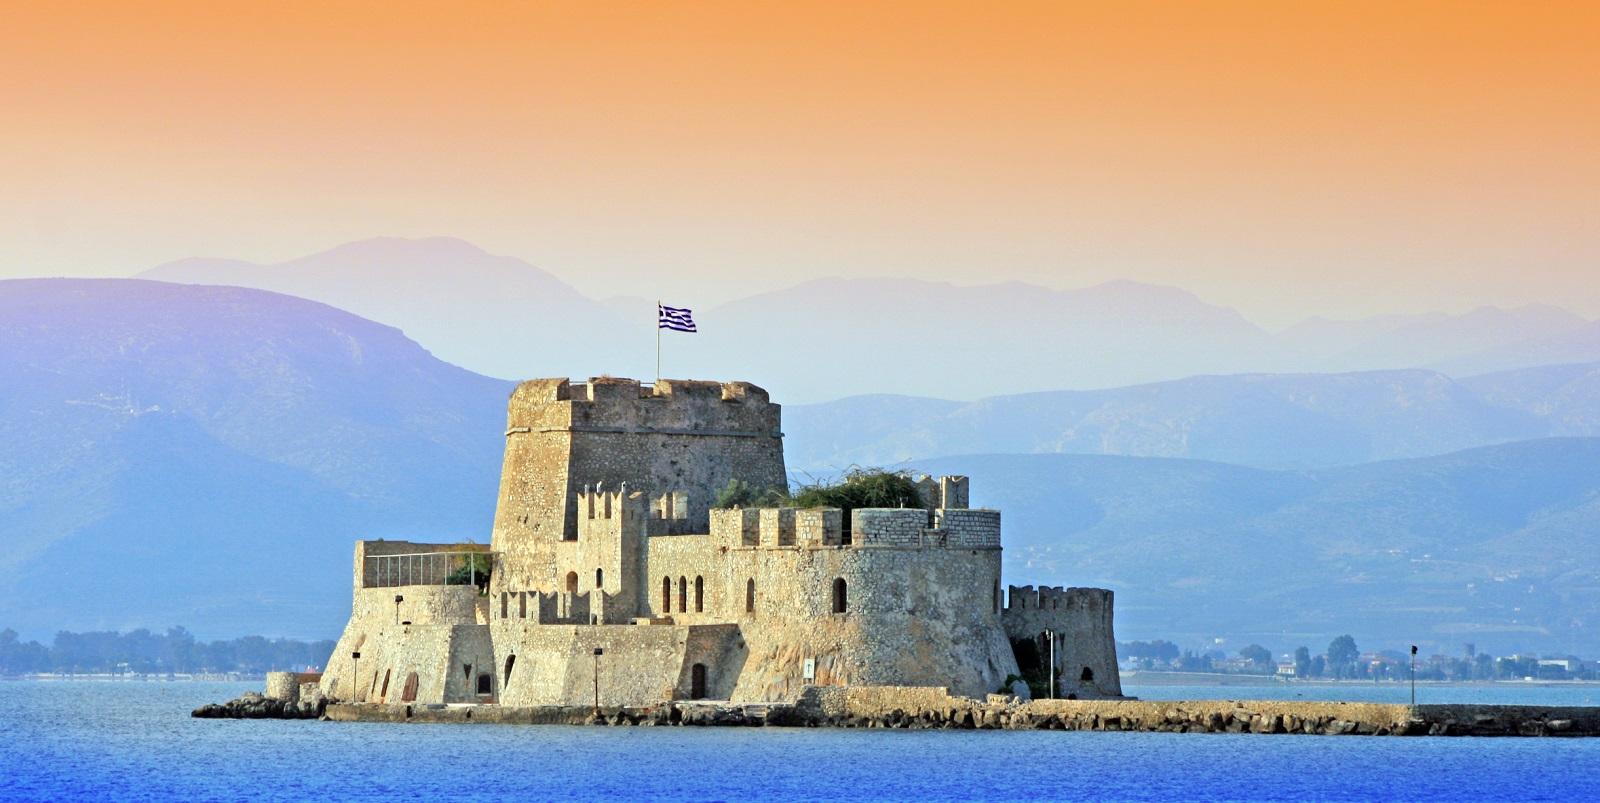 Nafplion Excursion, Greece